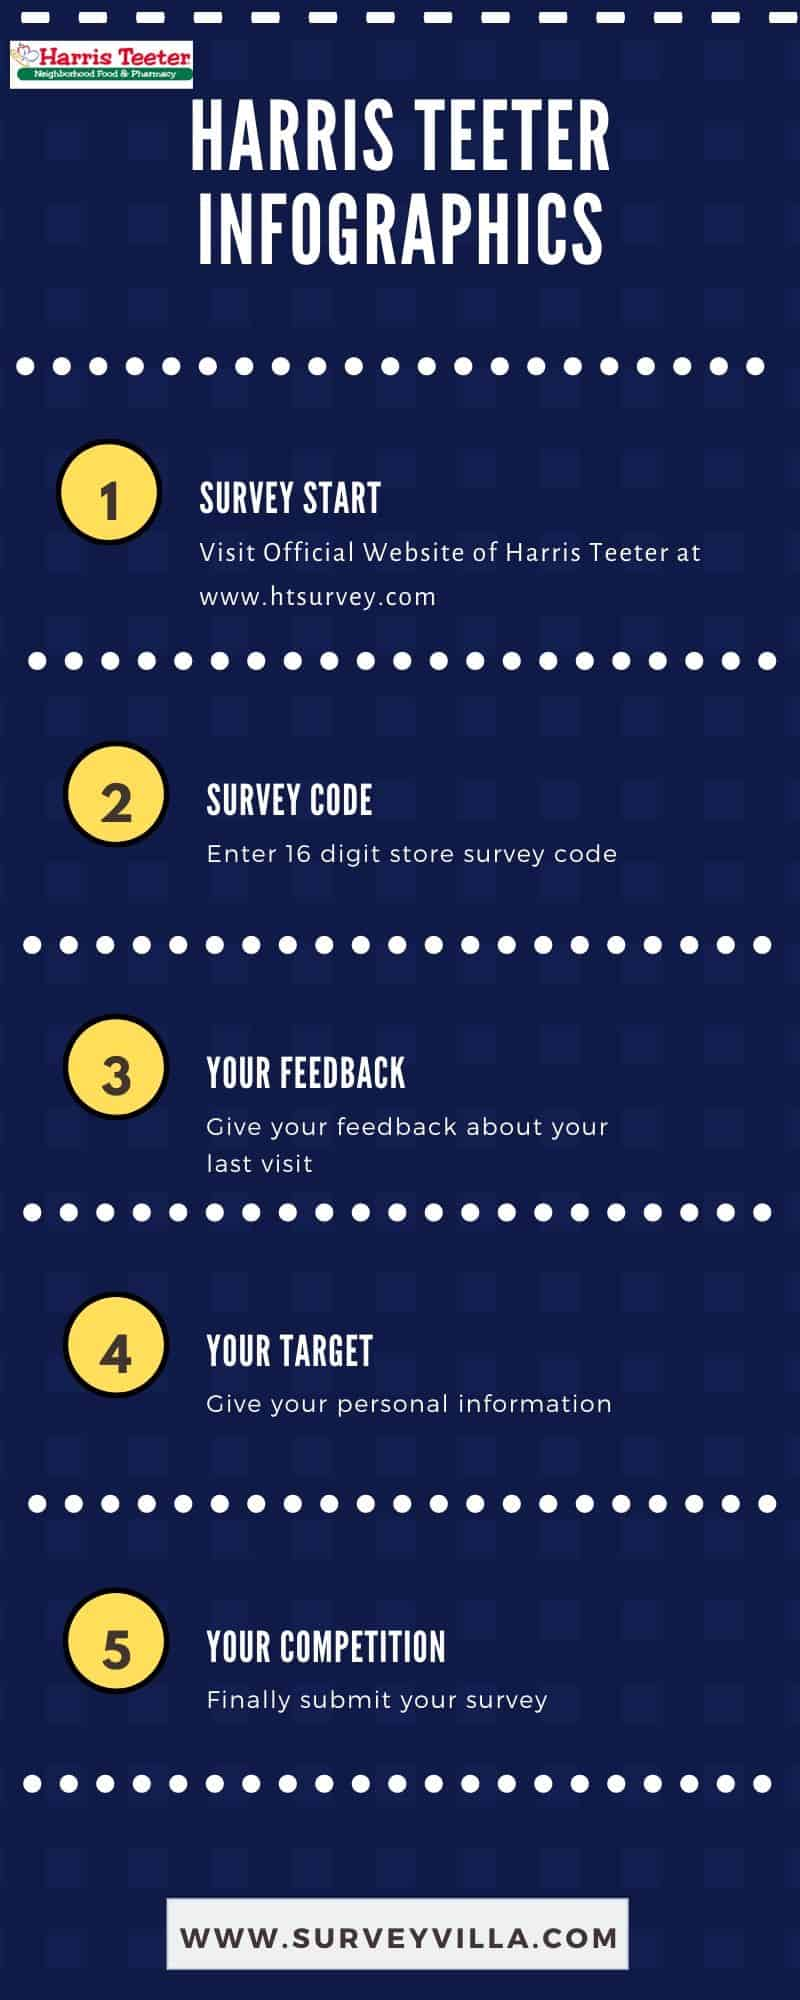 Harris Teeter Survey Quick Guide